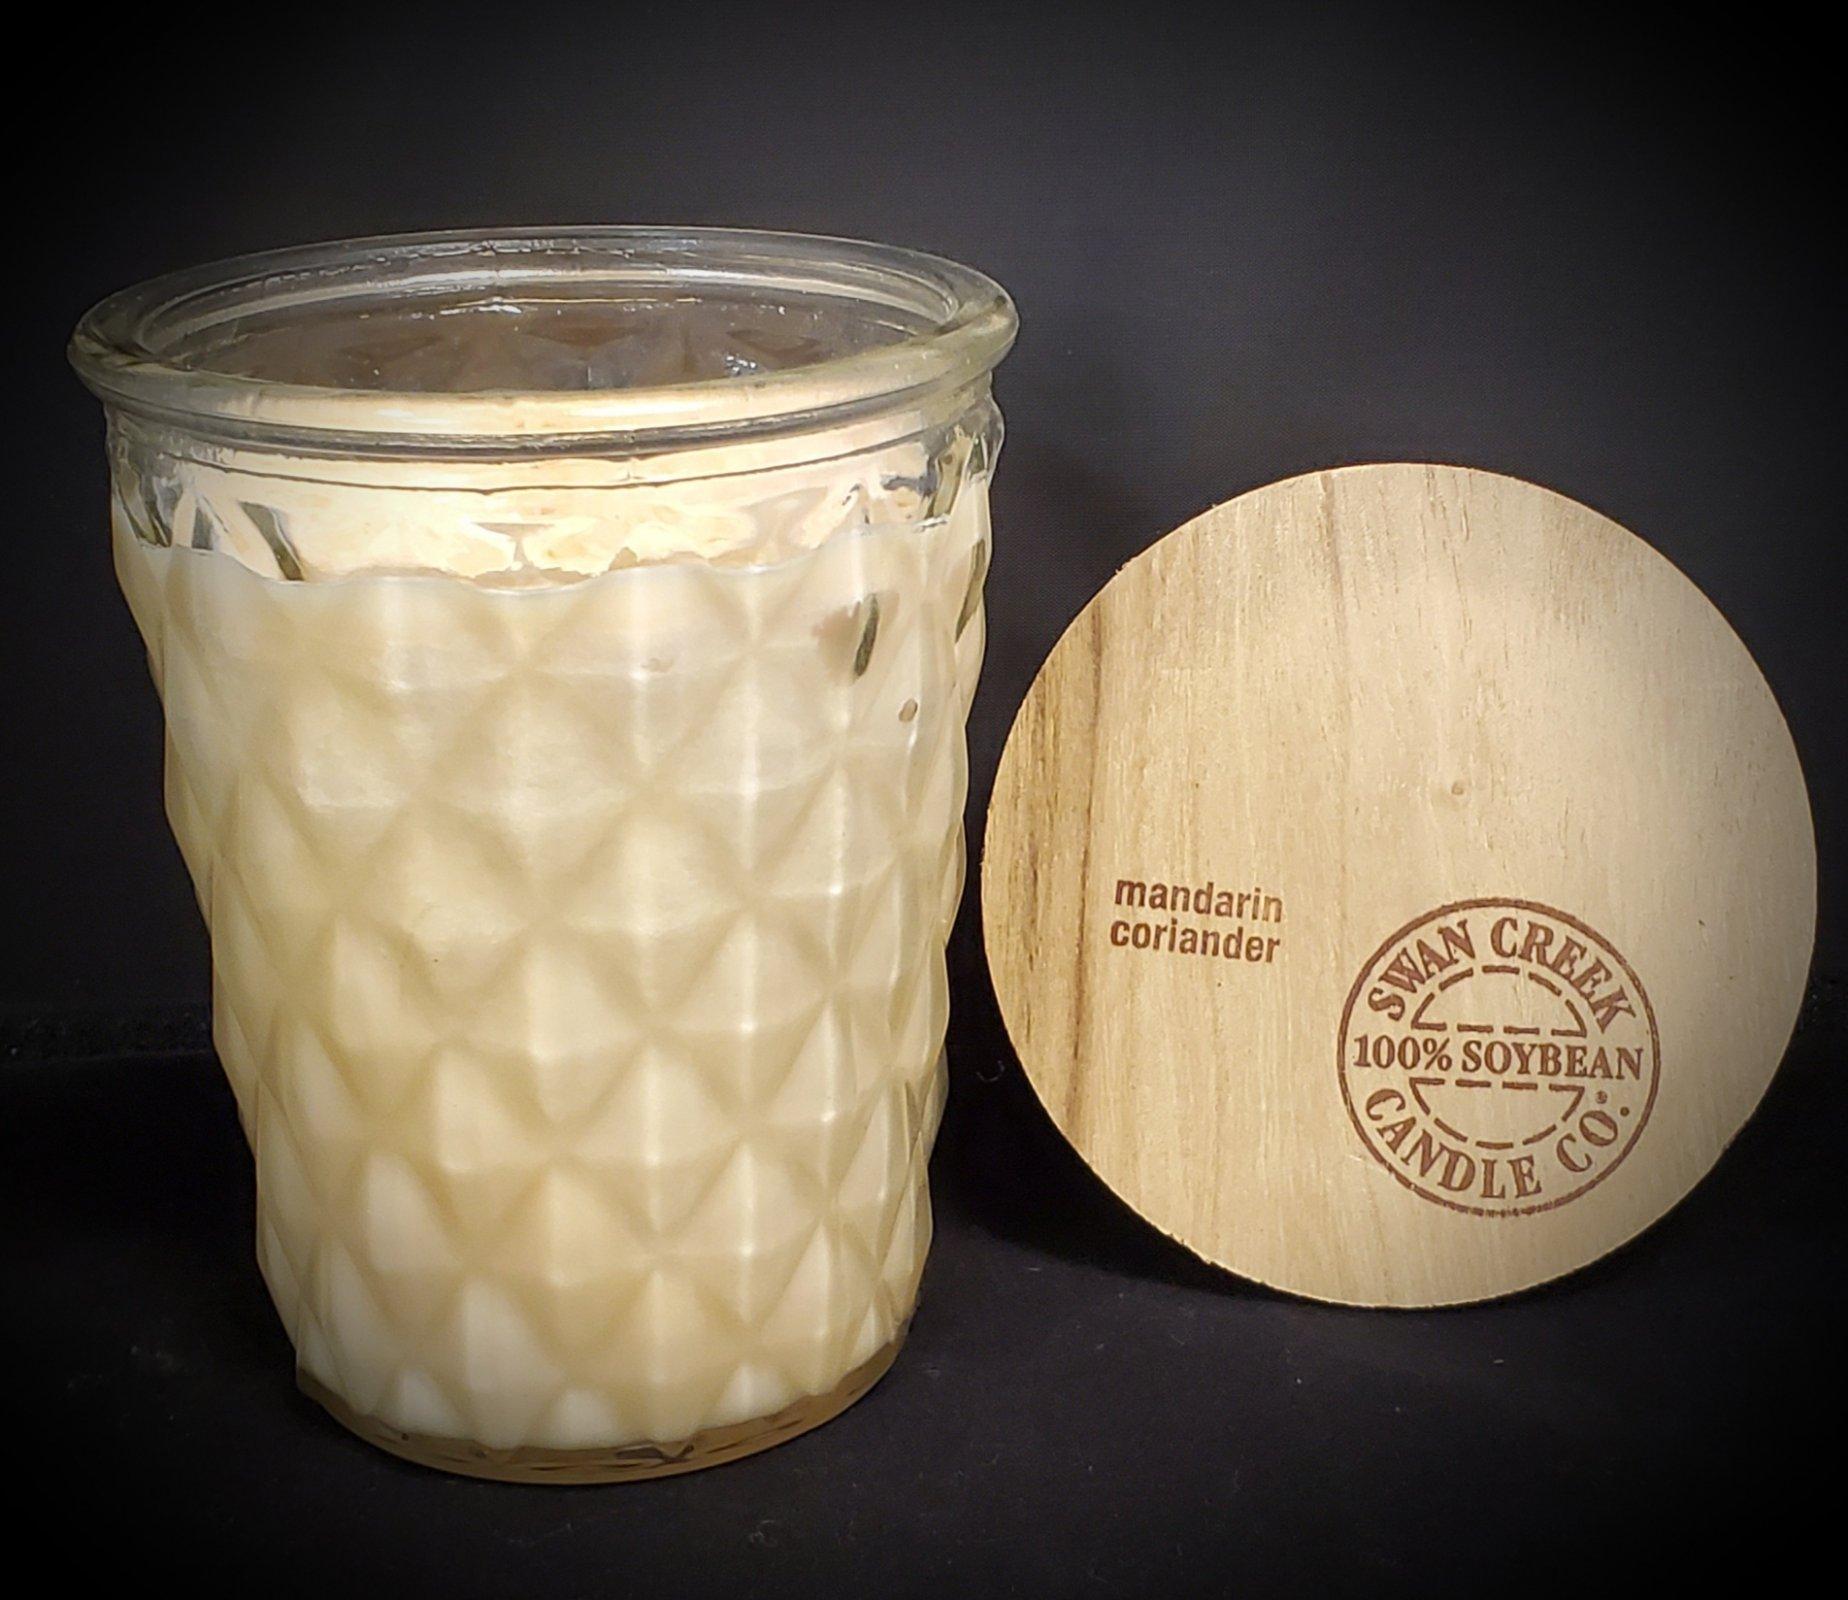 Swan Creek Candles Timeless Jar - Mandarin coriander